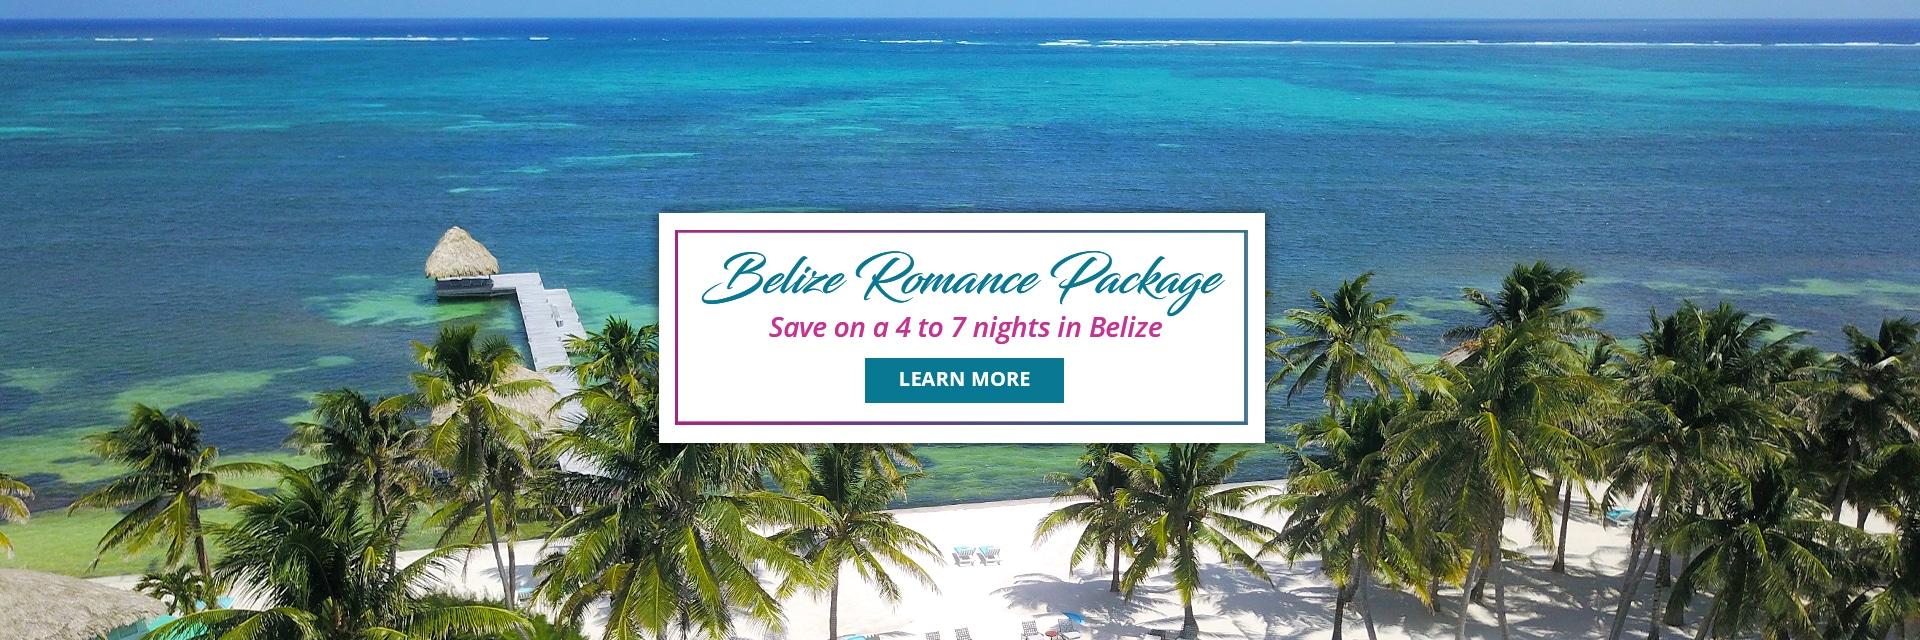 Belize Romance packages